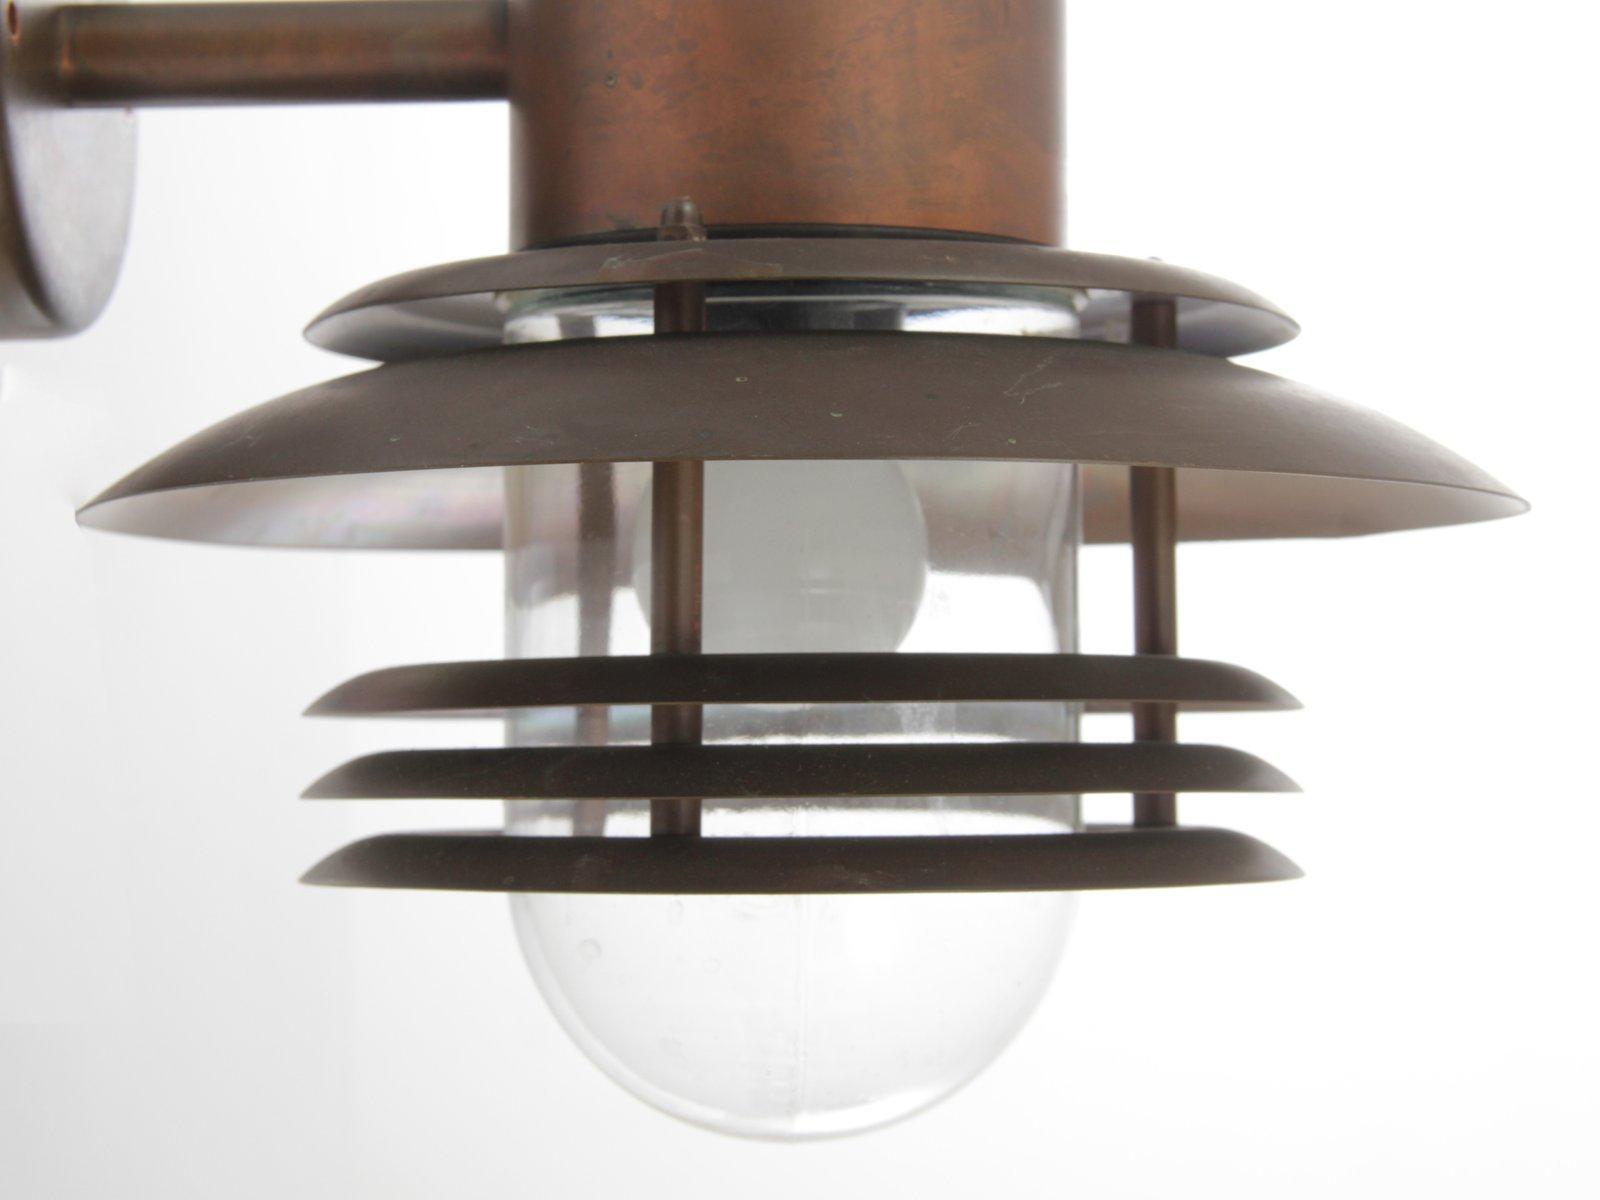 Au en wandlampe aus kupfer 1980er bei pamono kaufen - Aussen wandlampe ...